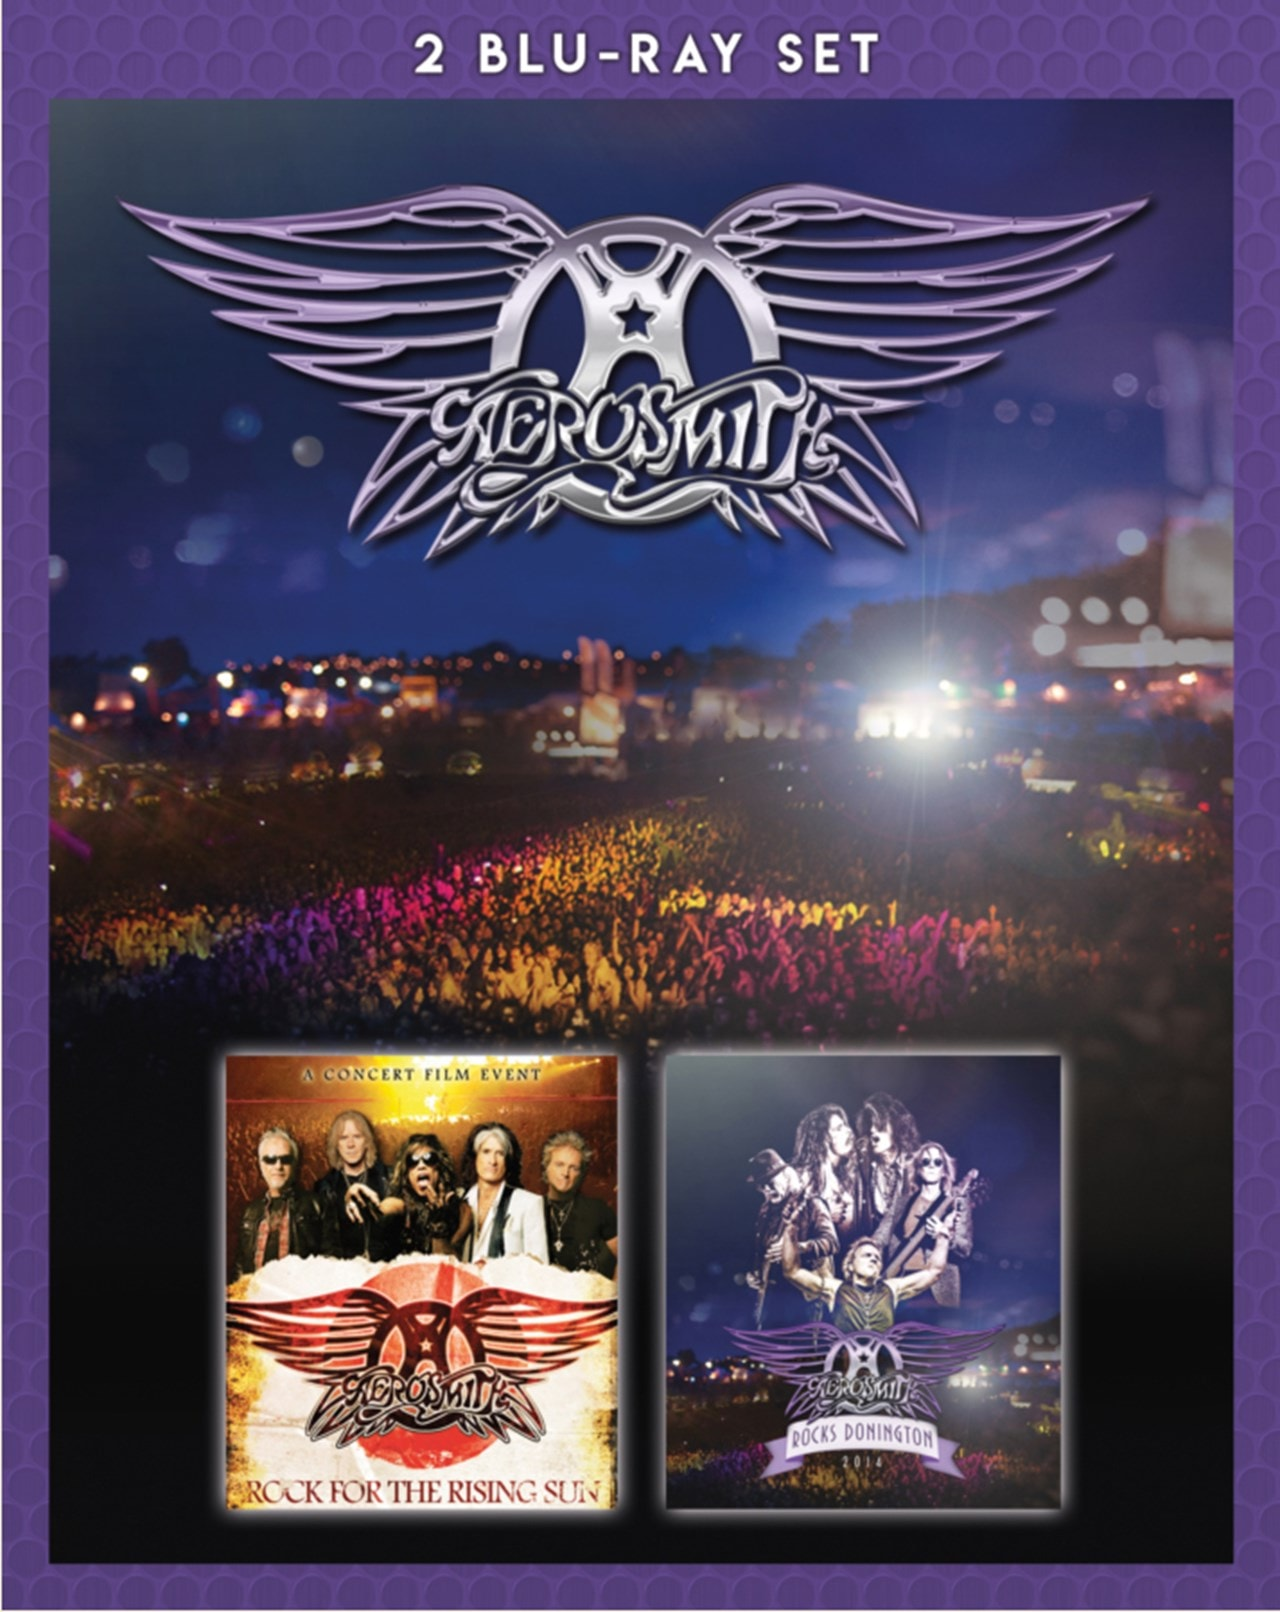 Aerosmith Rocks Donington/Aerosmith: Rock for the Rising Sun - 1